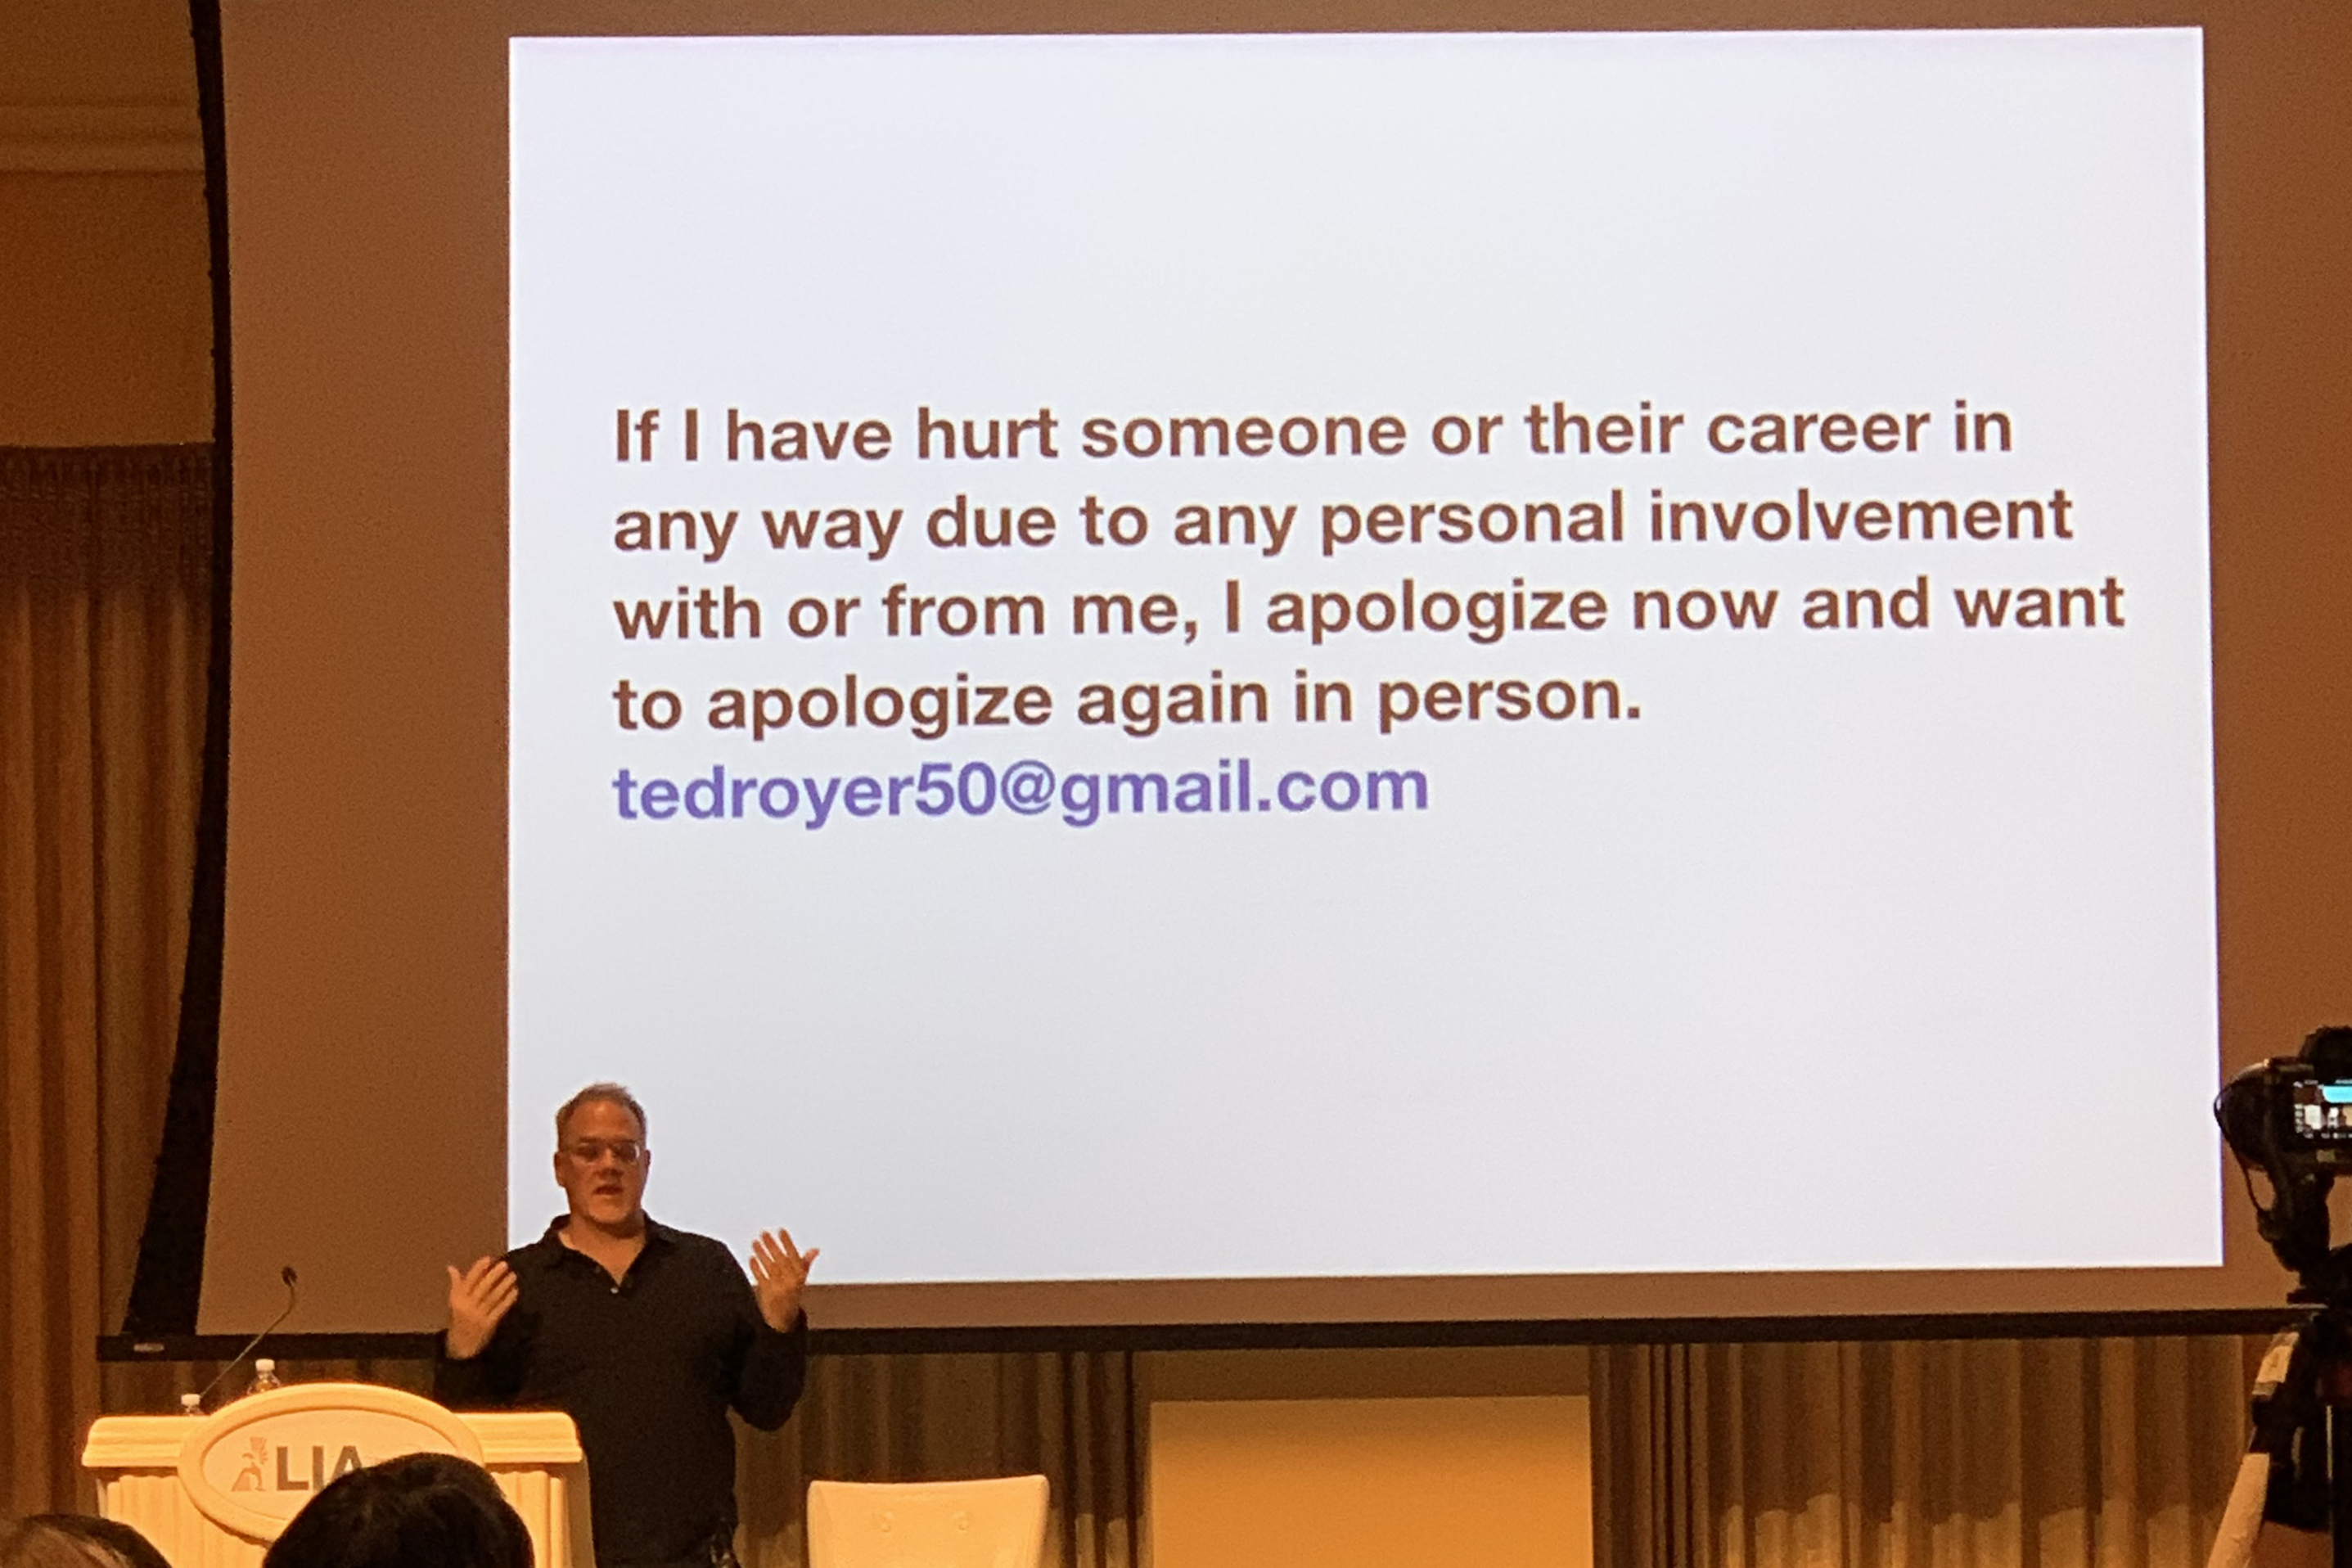 Ted Royer LIA apology